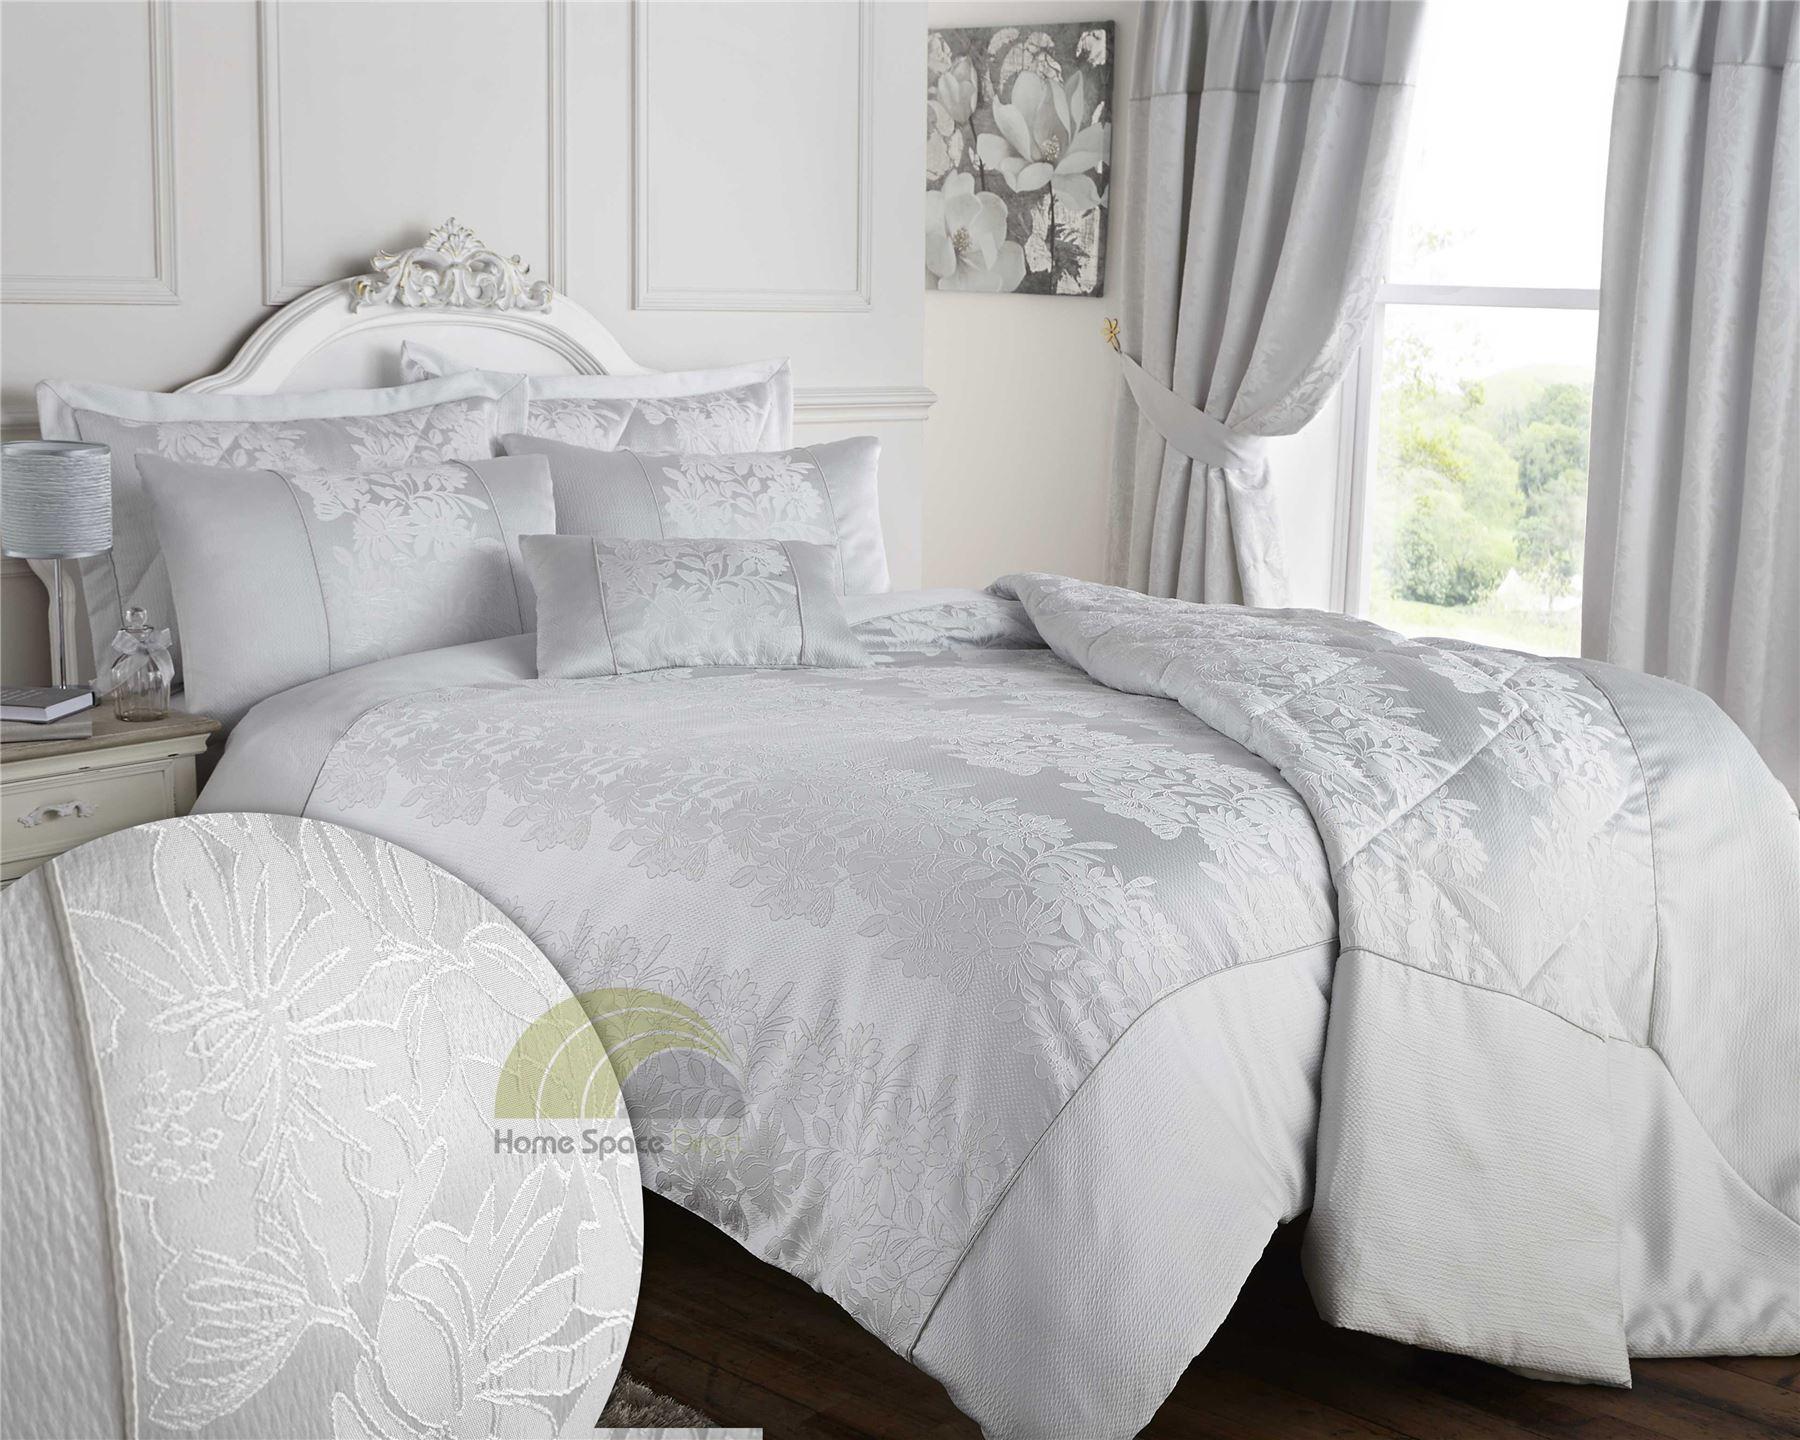 Luxury Woven Jacquard Quilt Duvet Cover Bedding Bed Linen Sets ... : jacquard quilt cover sets - Adamdwight.com